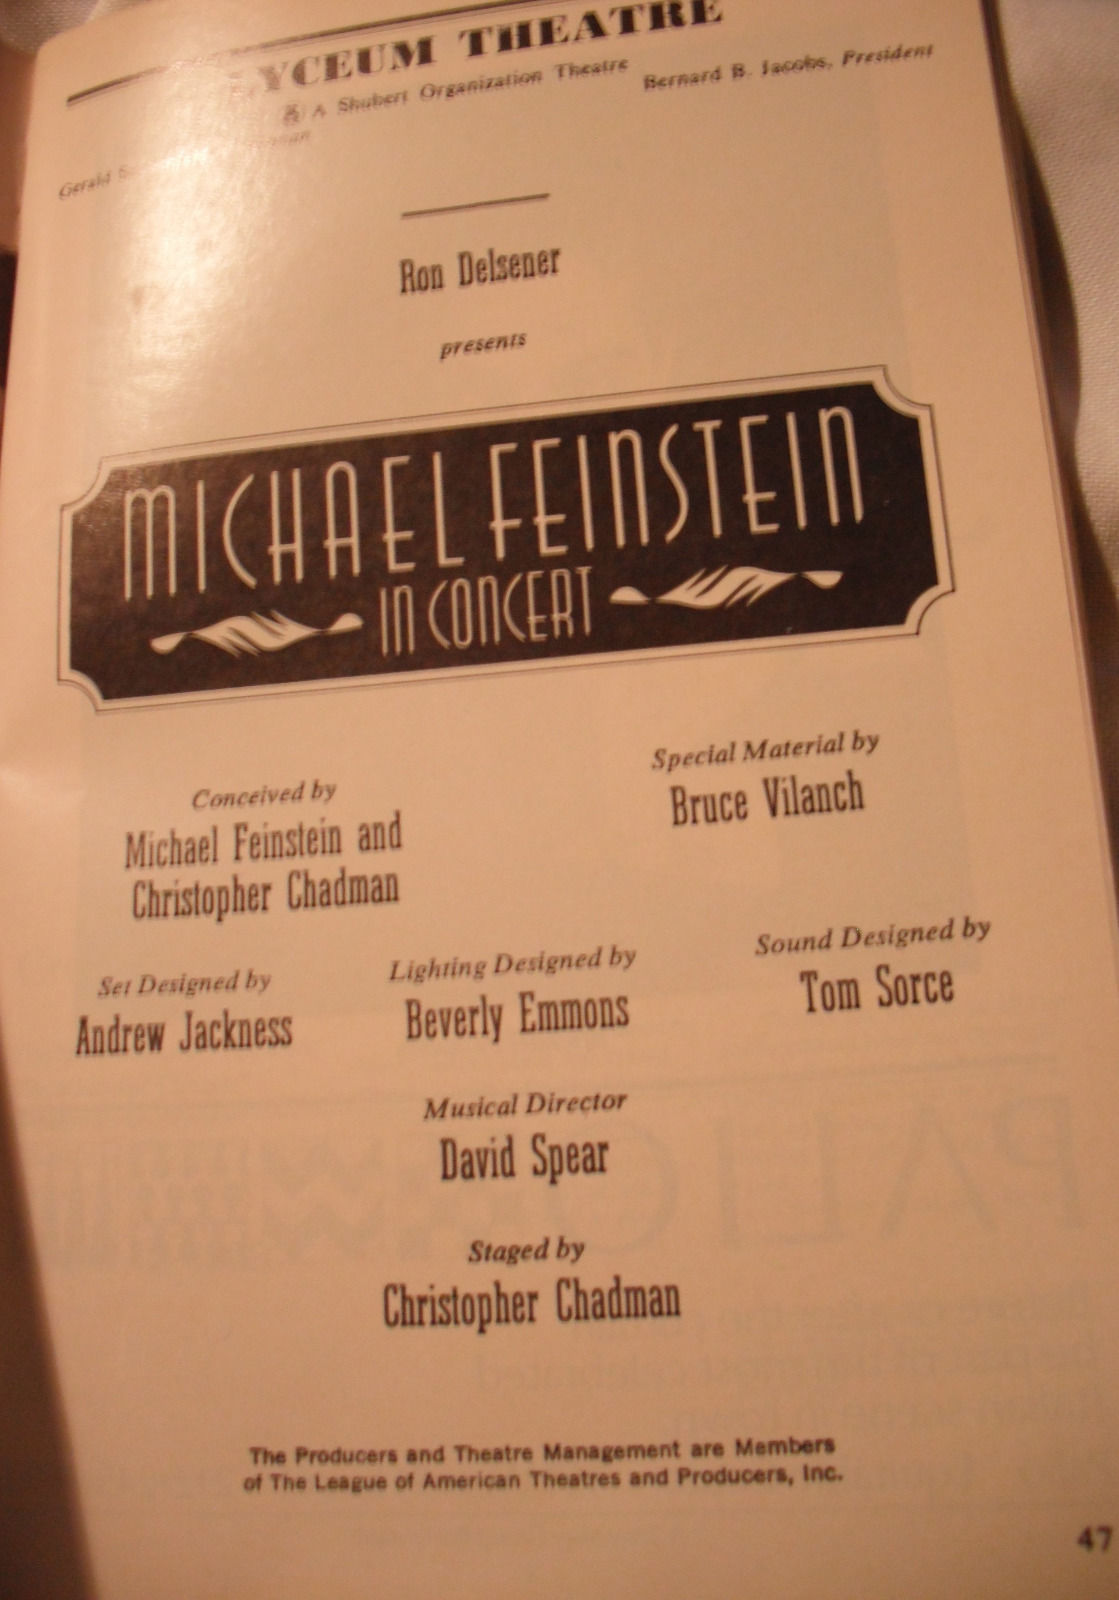 MICHAEL FEINSTEIN IN CONCERT PLAYBILL